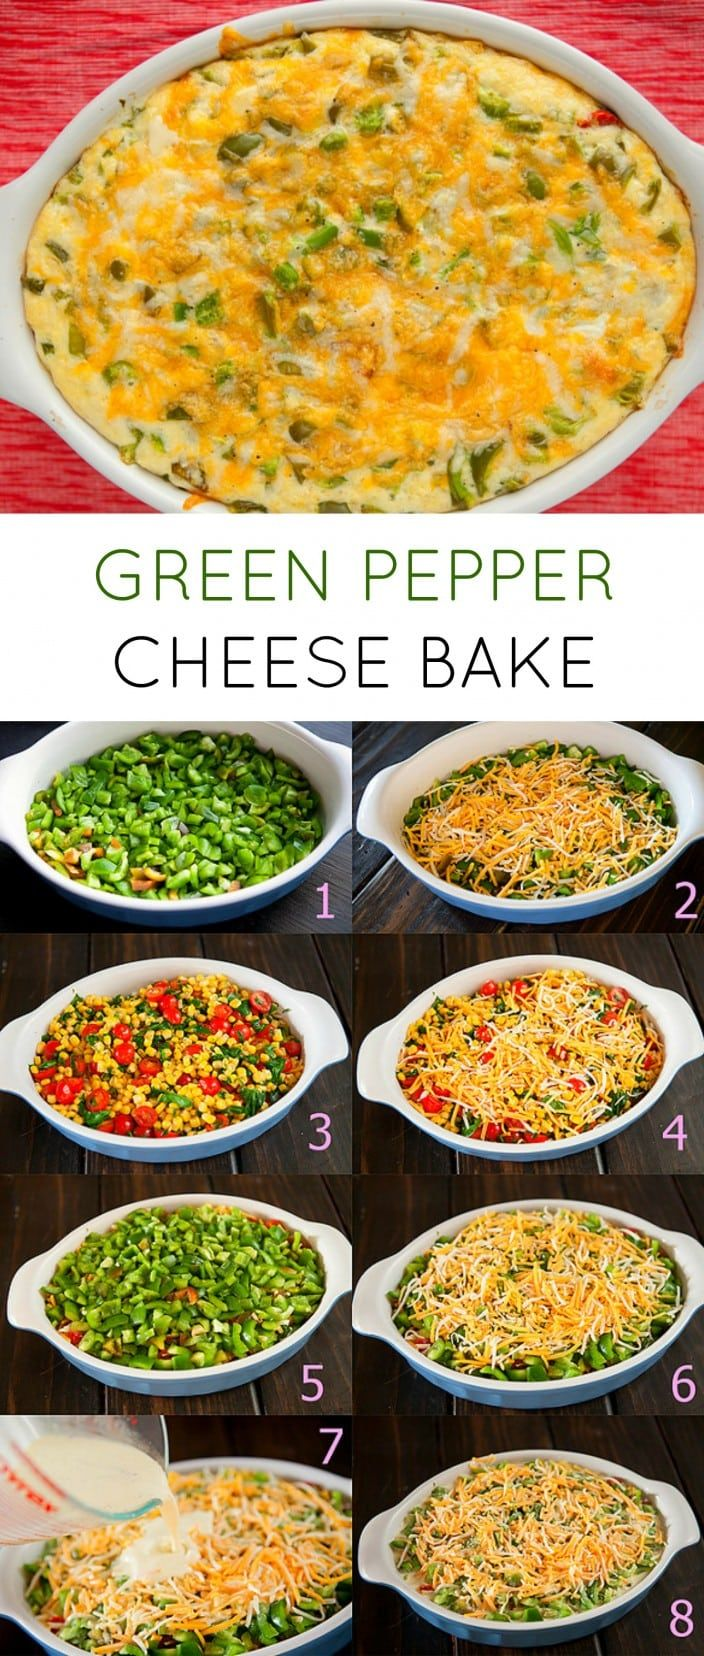 Green Pepper Cheese Bake